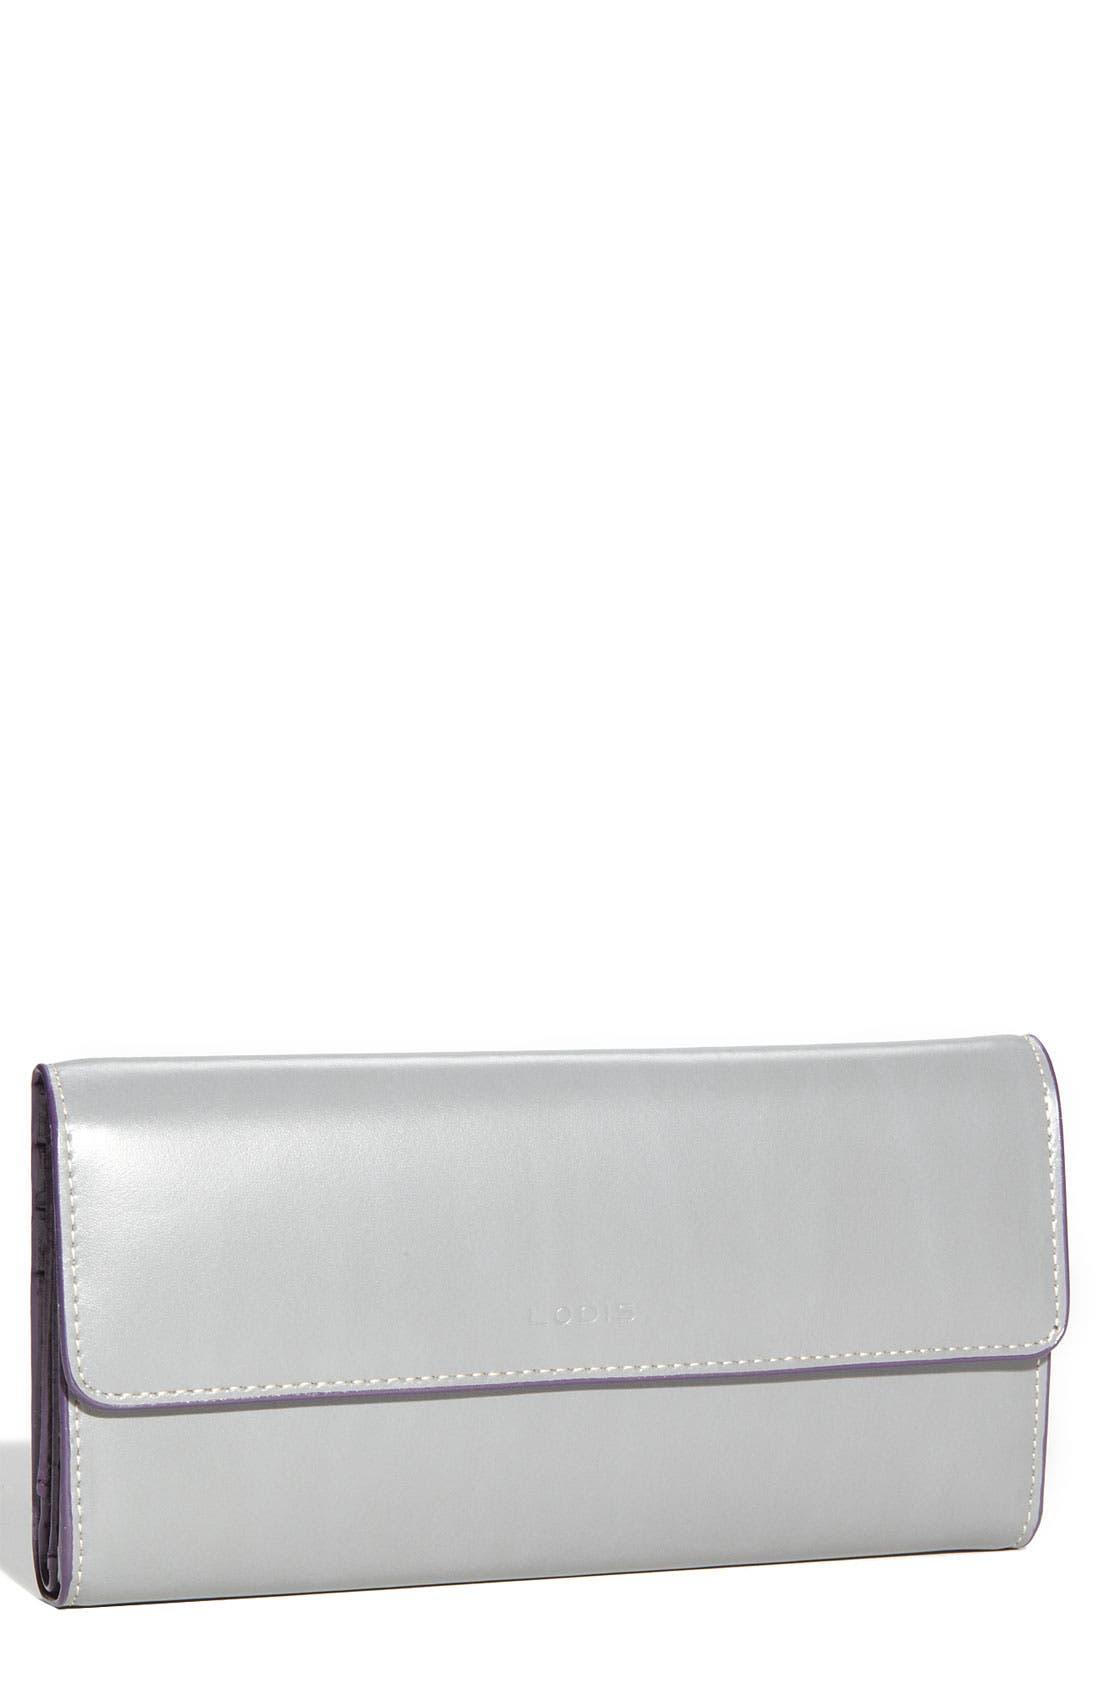 Lodis 'Audrey' Checkbook Clutch Wallet,                             Main thumbnail 1, color,                             035